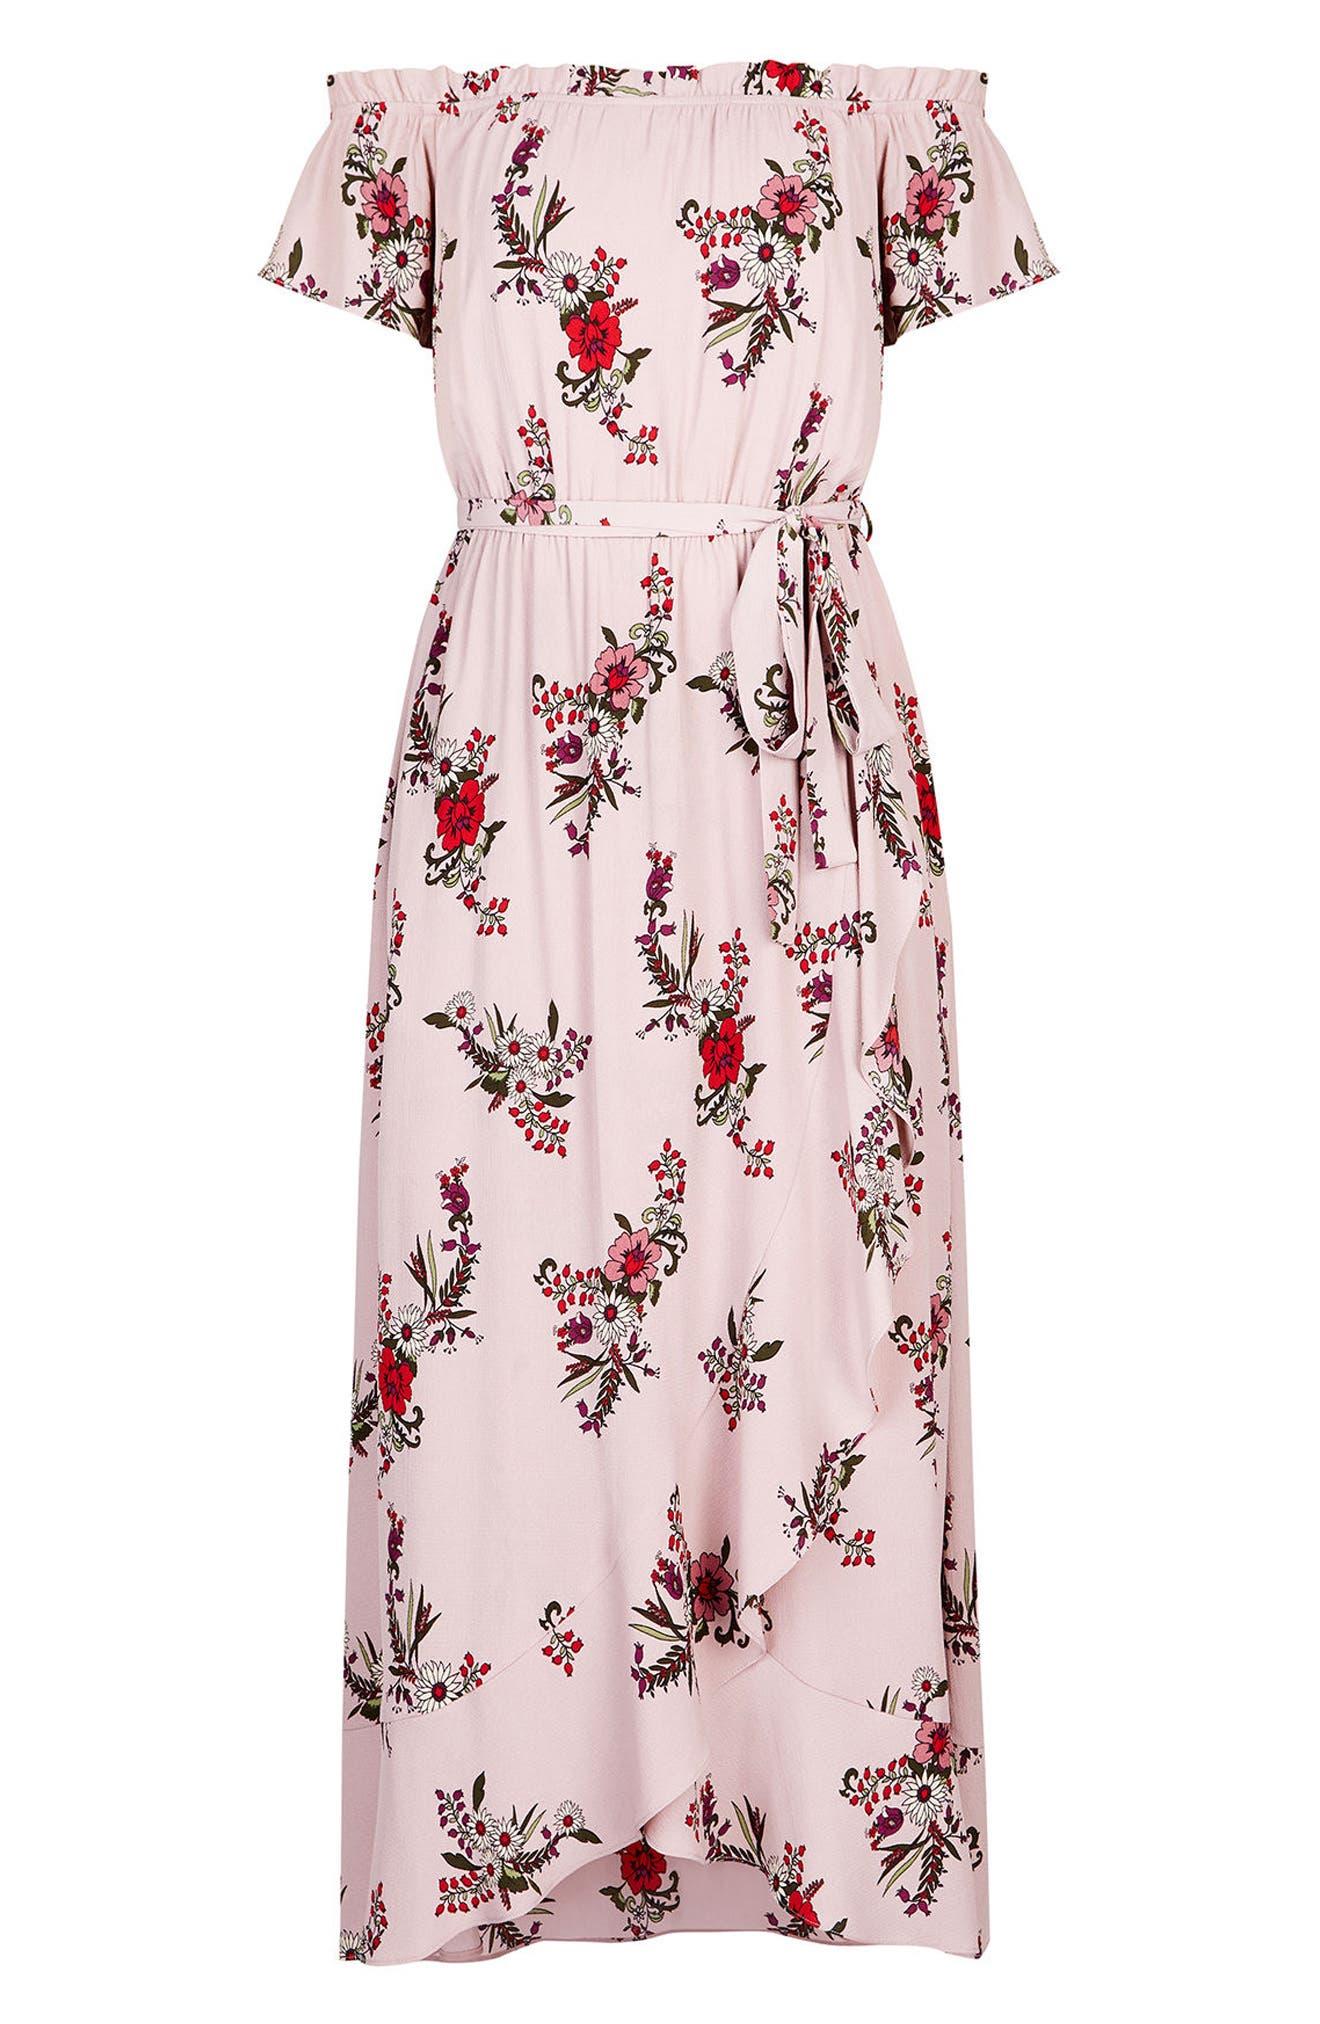 Sky Floral Off the Shoulder Maxi Dress,                             Alternate thumbnail 3, color,                             512